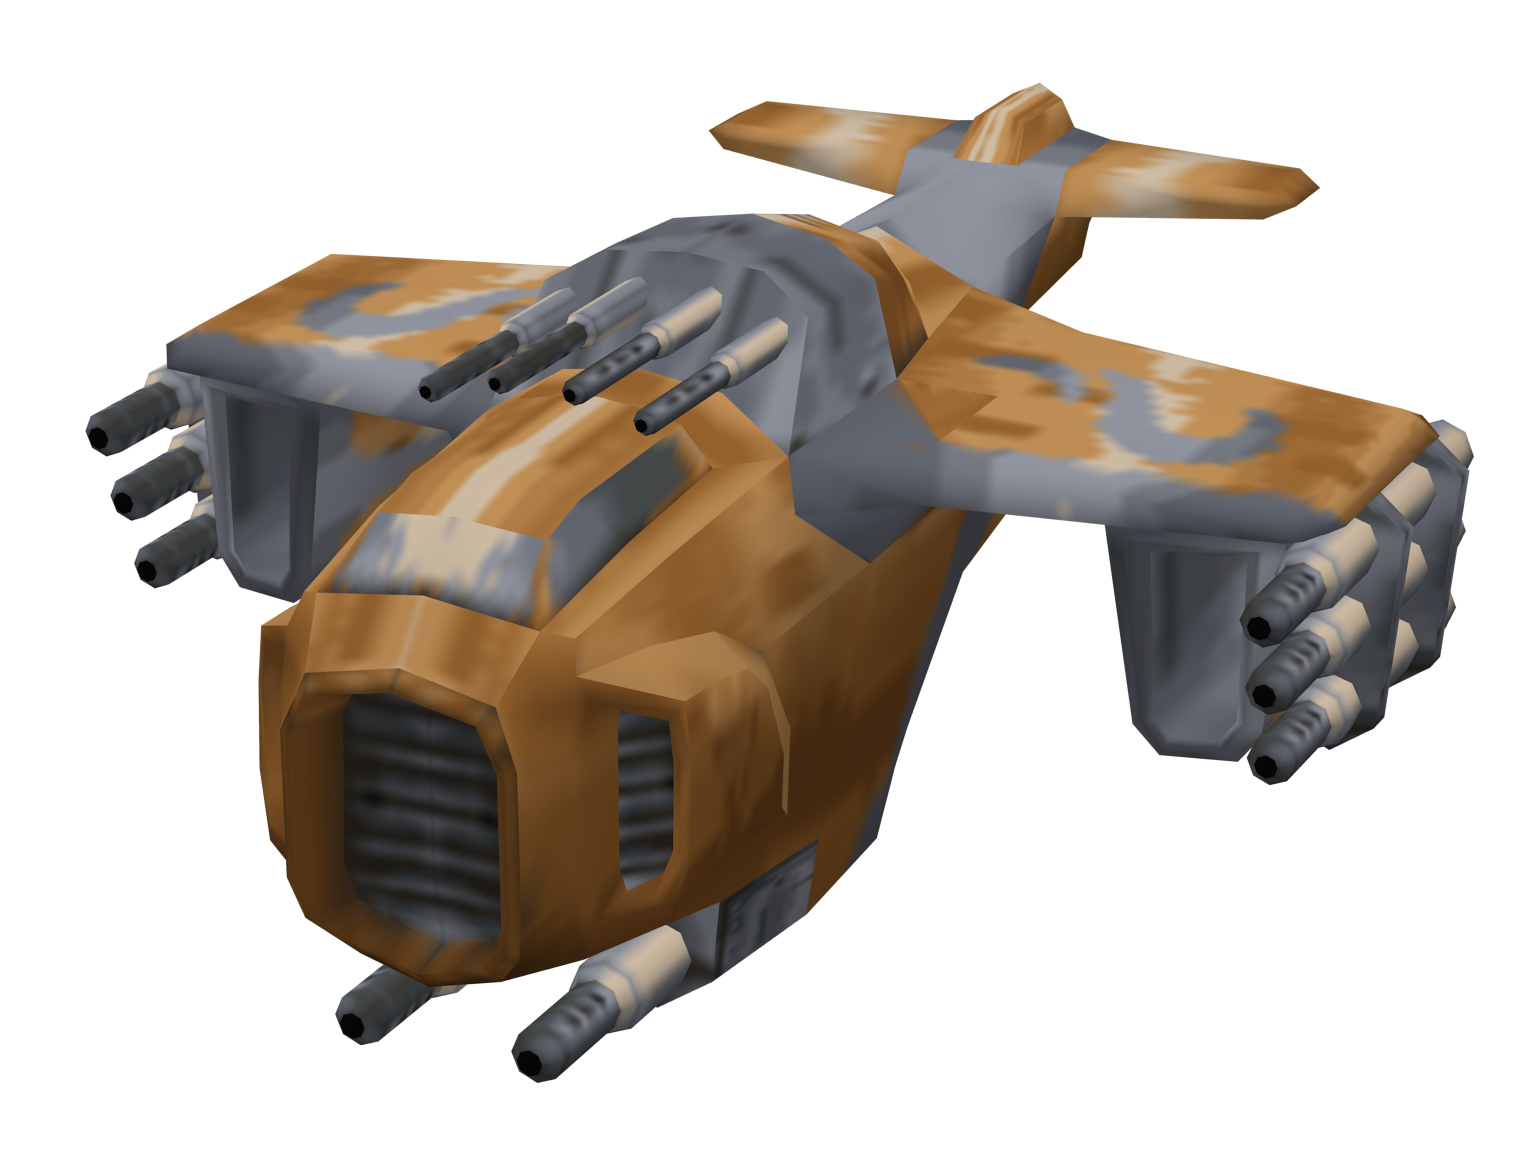 Aeropan heavy fighter